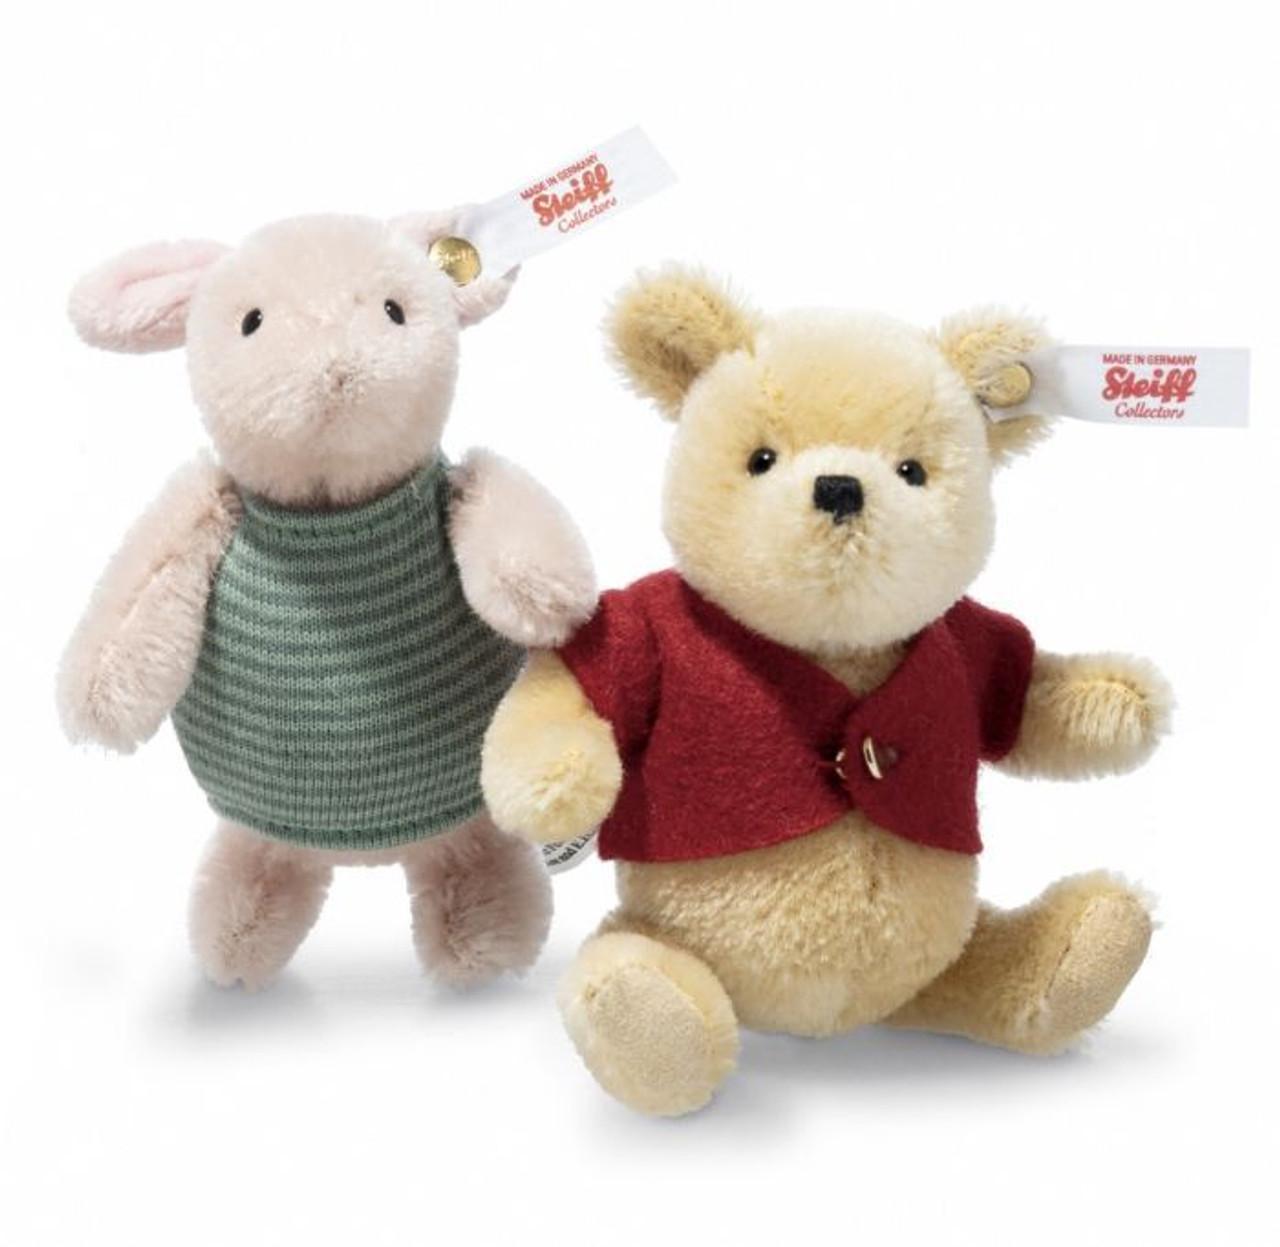 Disney Winnie the Pooh MIni Set  EAN 355875